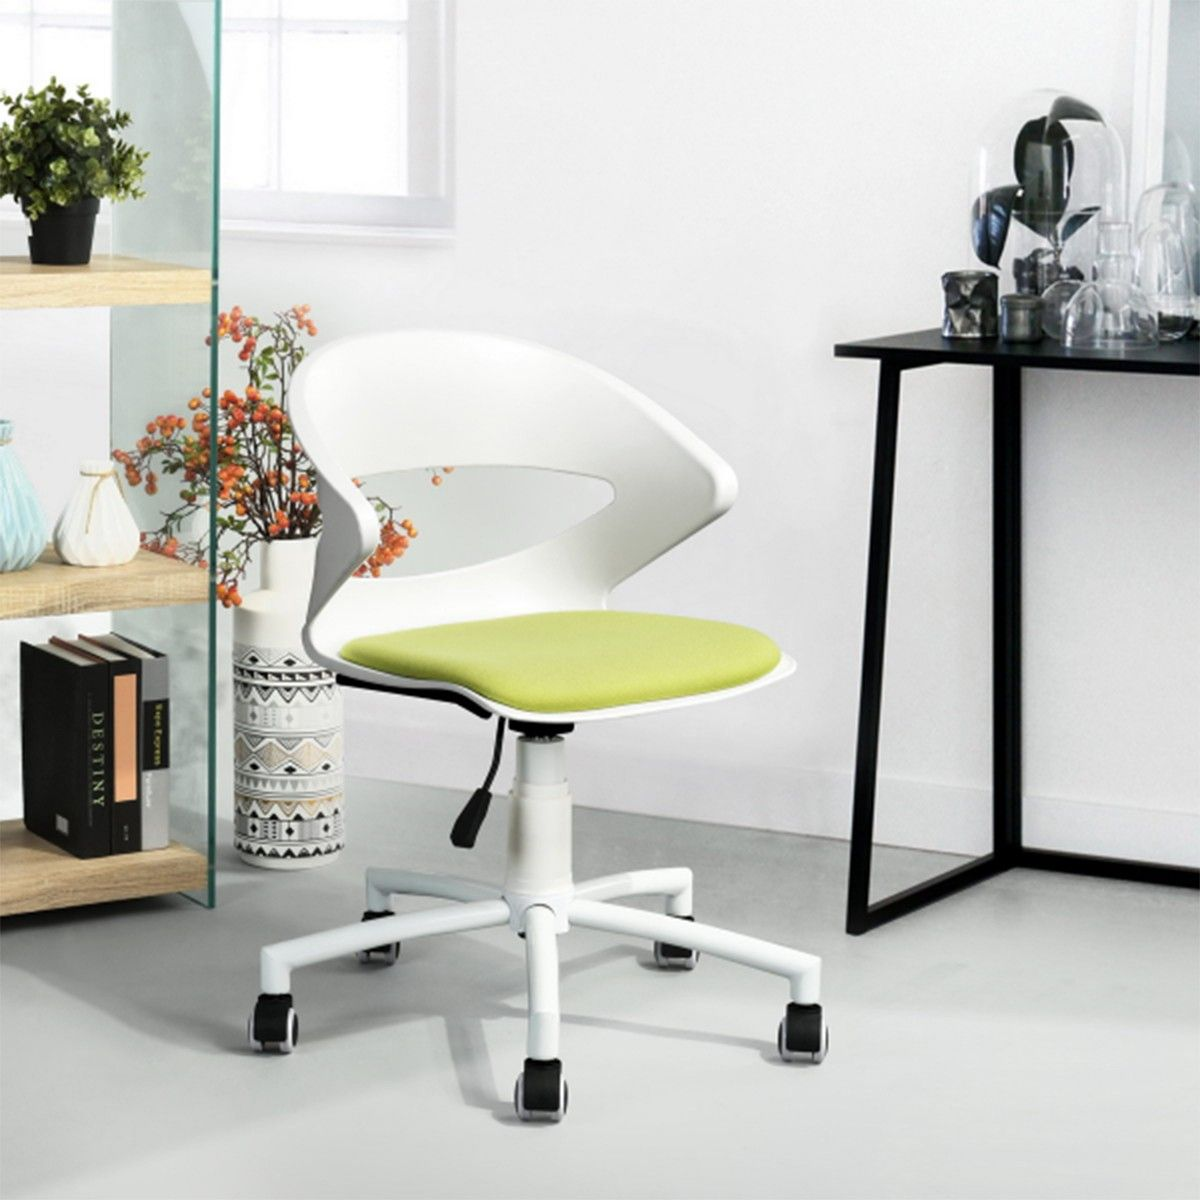 chaise de bureau design vert